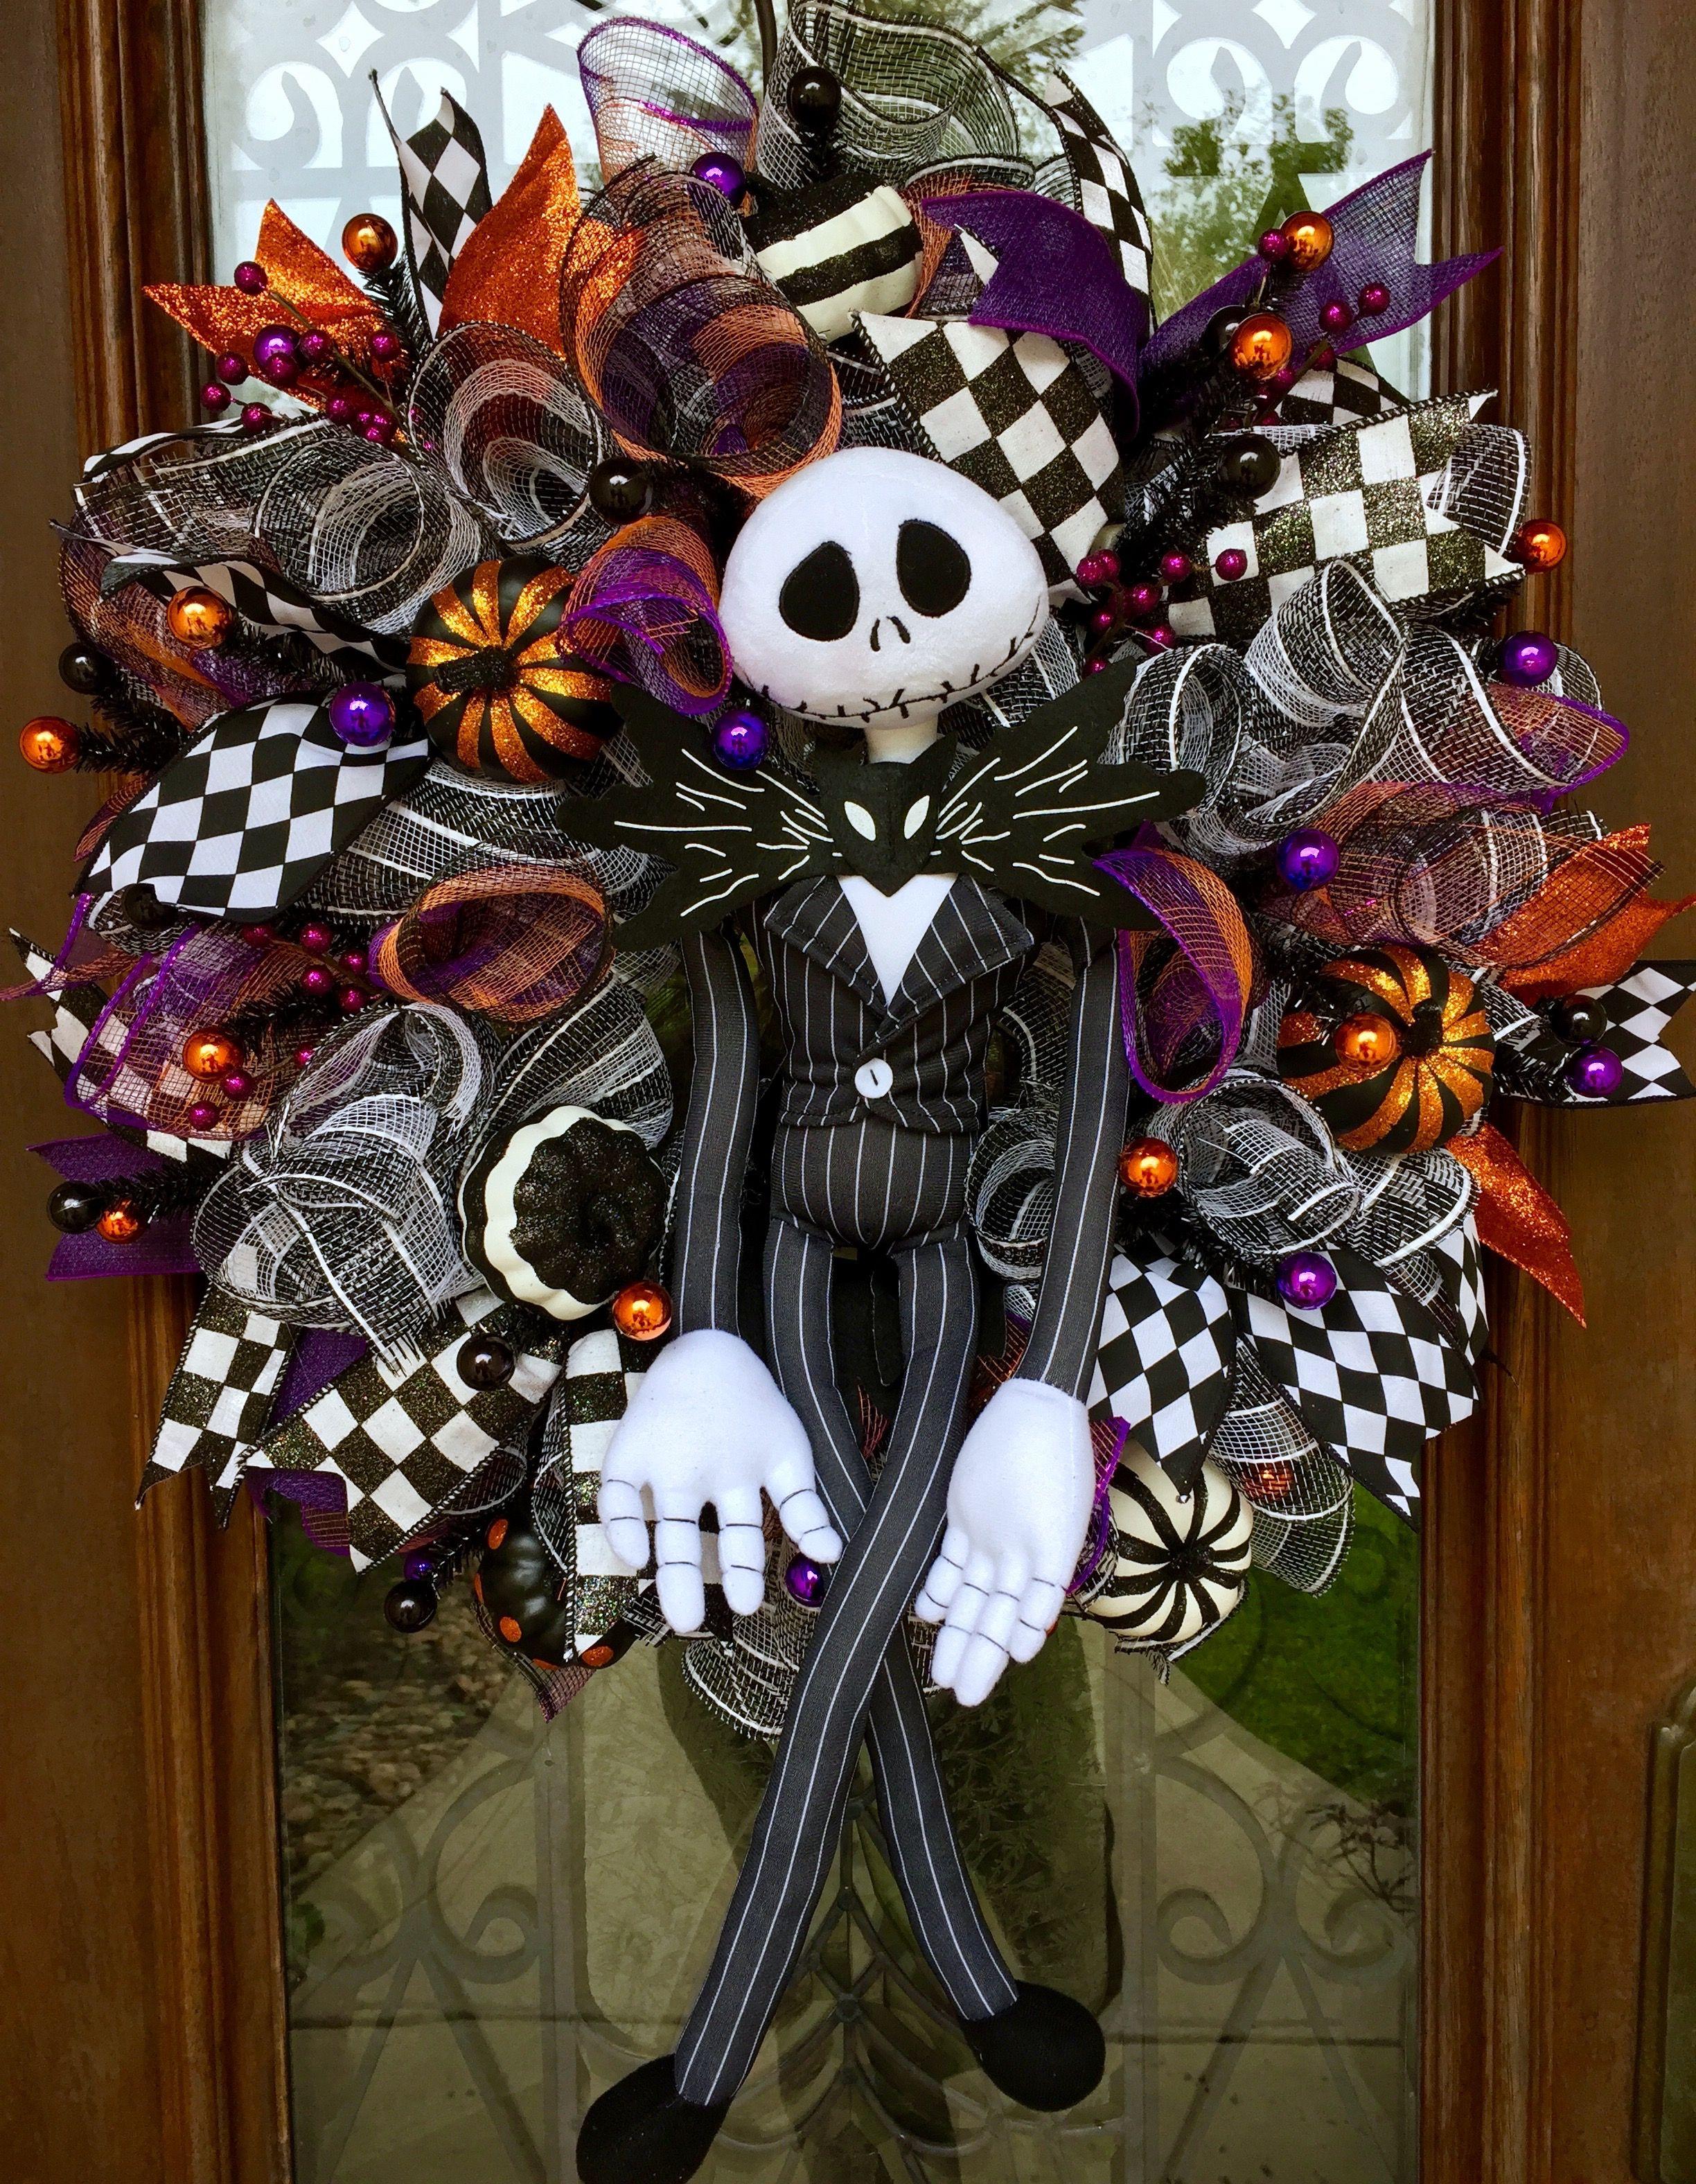 Jack Skellington Decorations Halloween Jack Skellington The Nightmare Before Christmas Wreath For